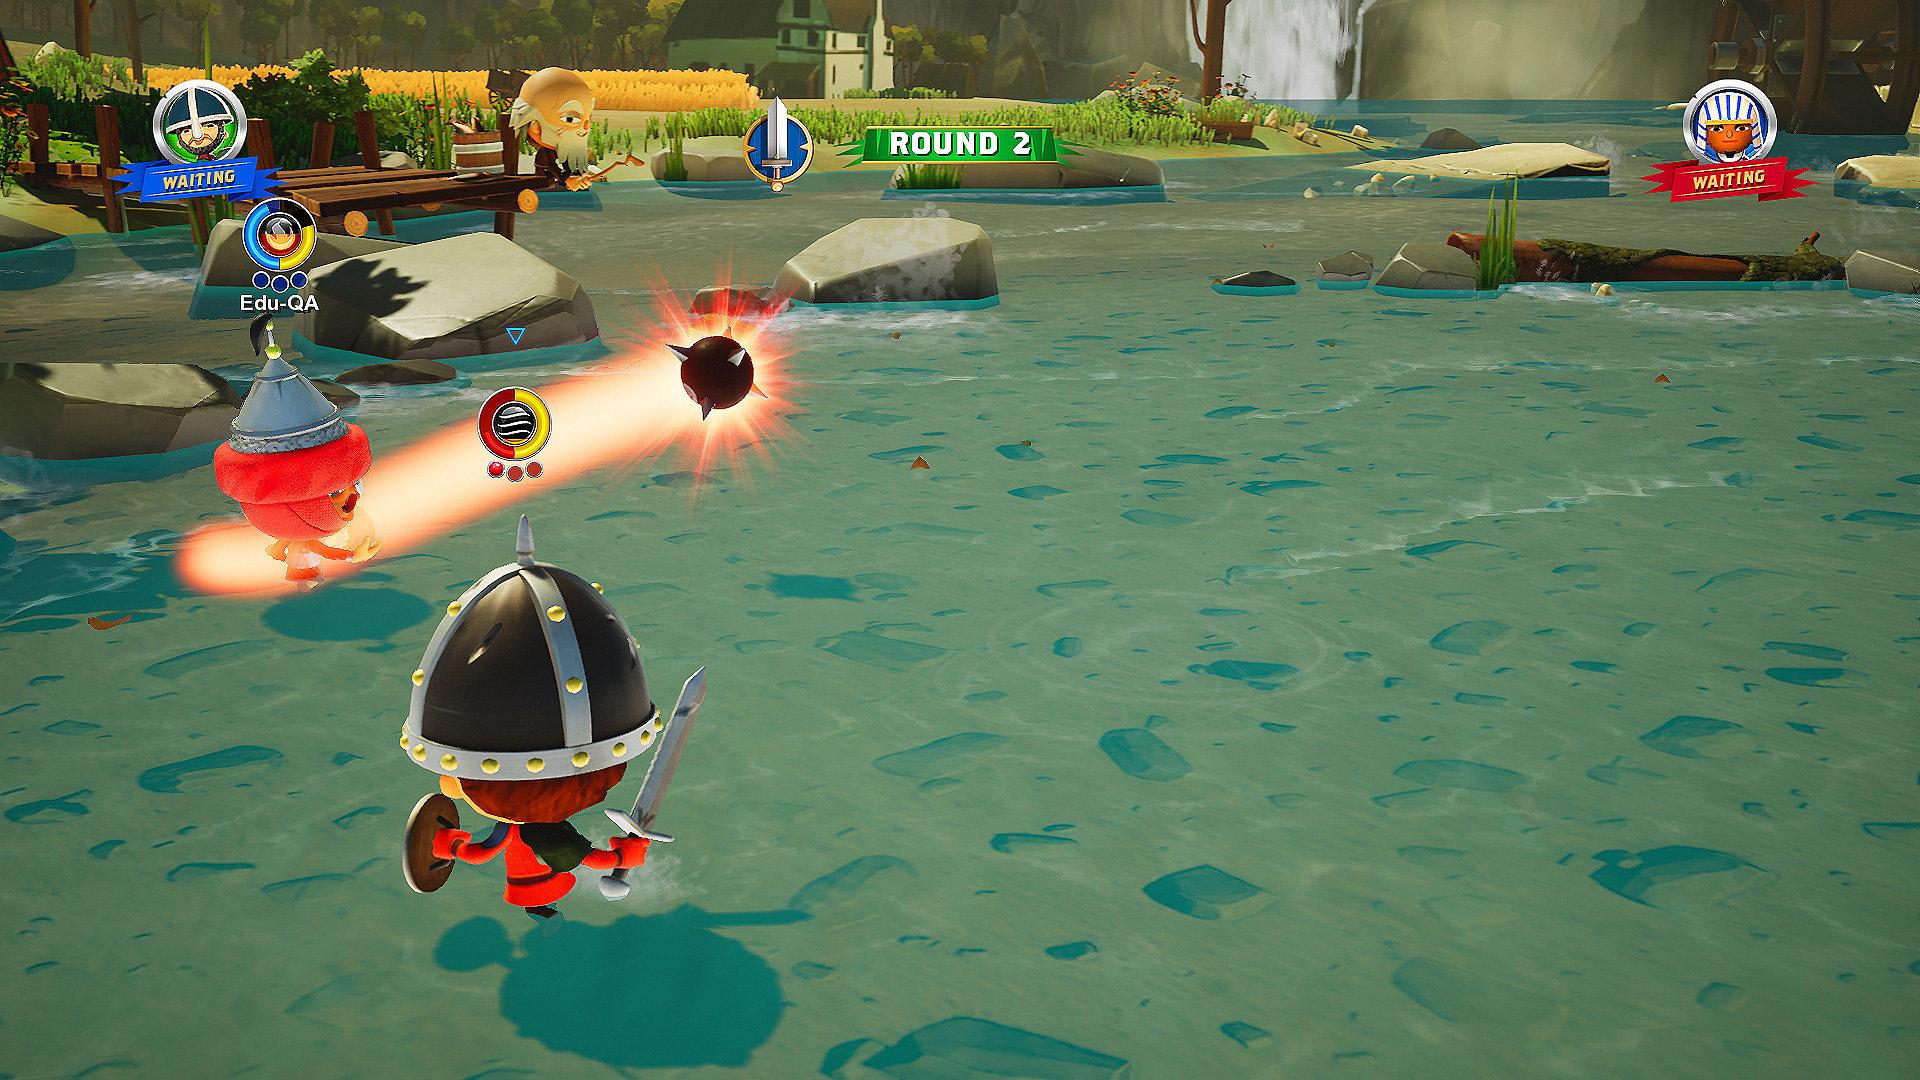 world-of-warriors-screen-02-ps4-eu-15feb17